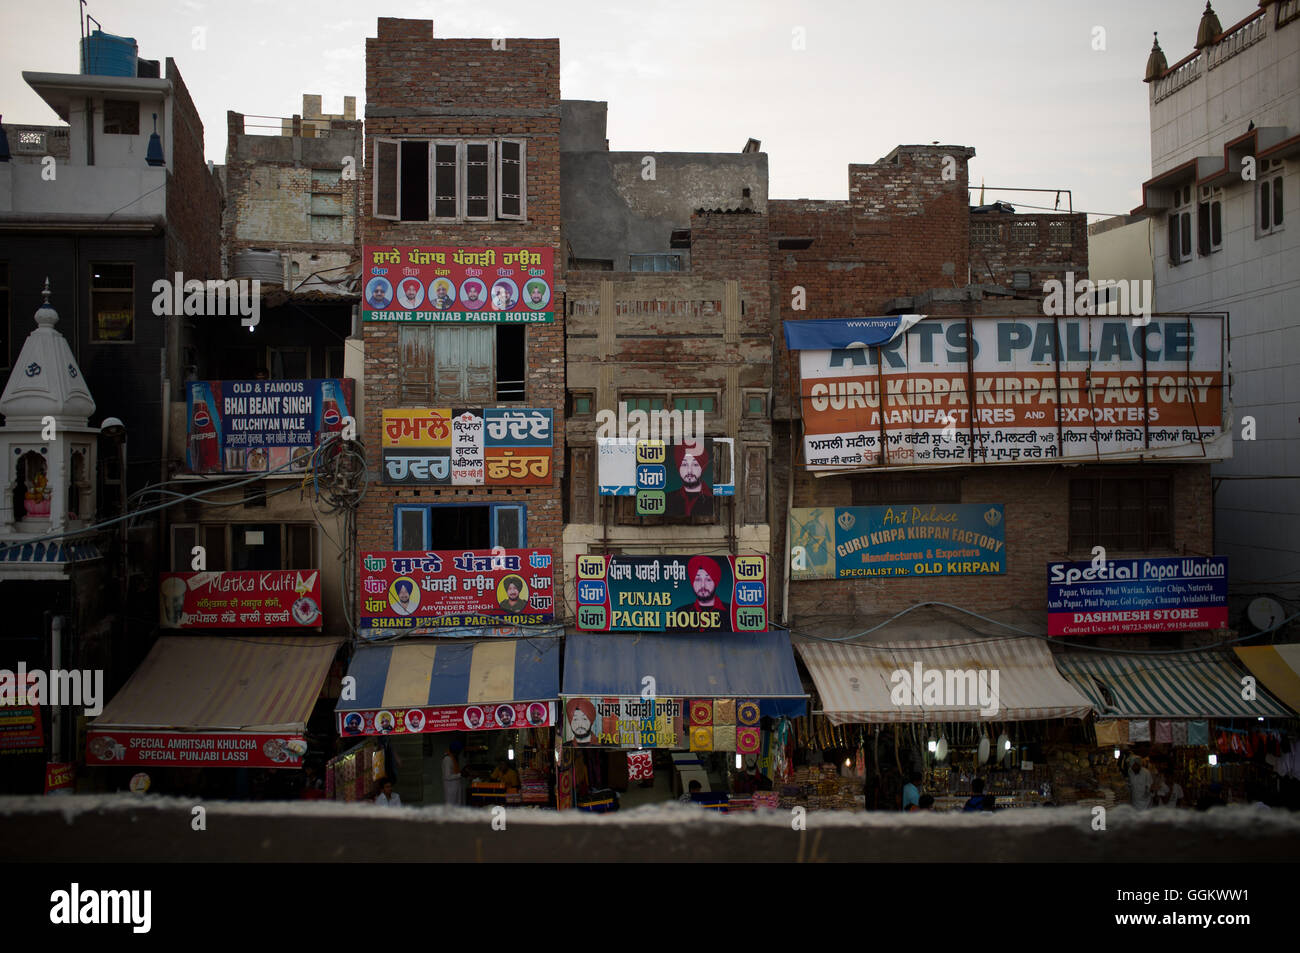 Ads on the facade of buildings in Amritsar, India. © Jordi Boixareu - Stock Image